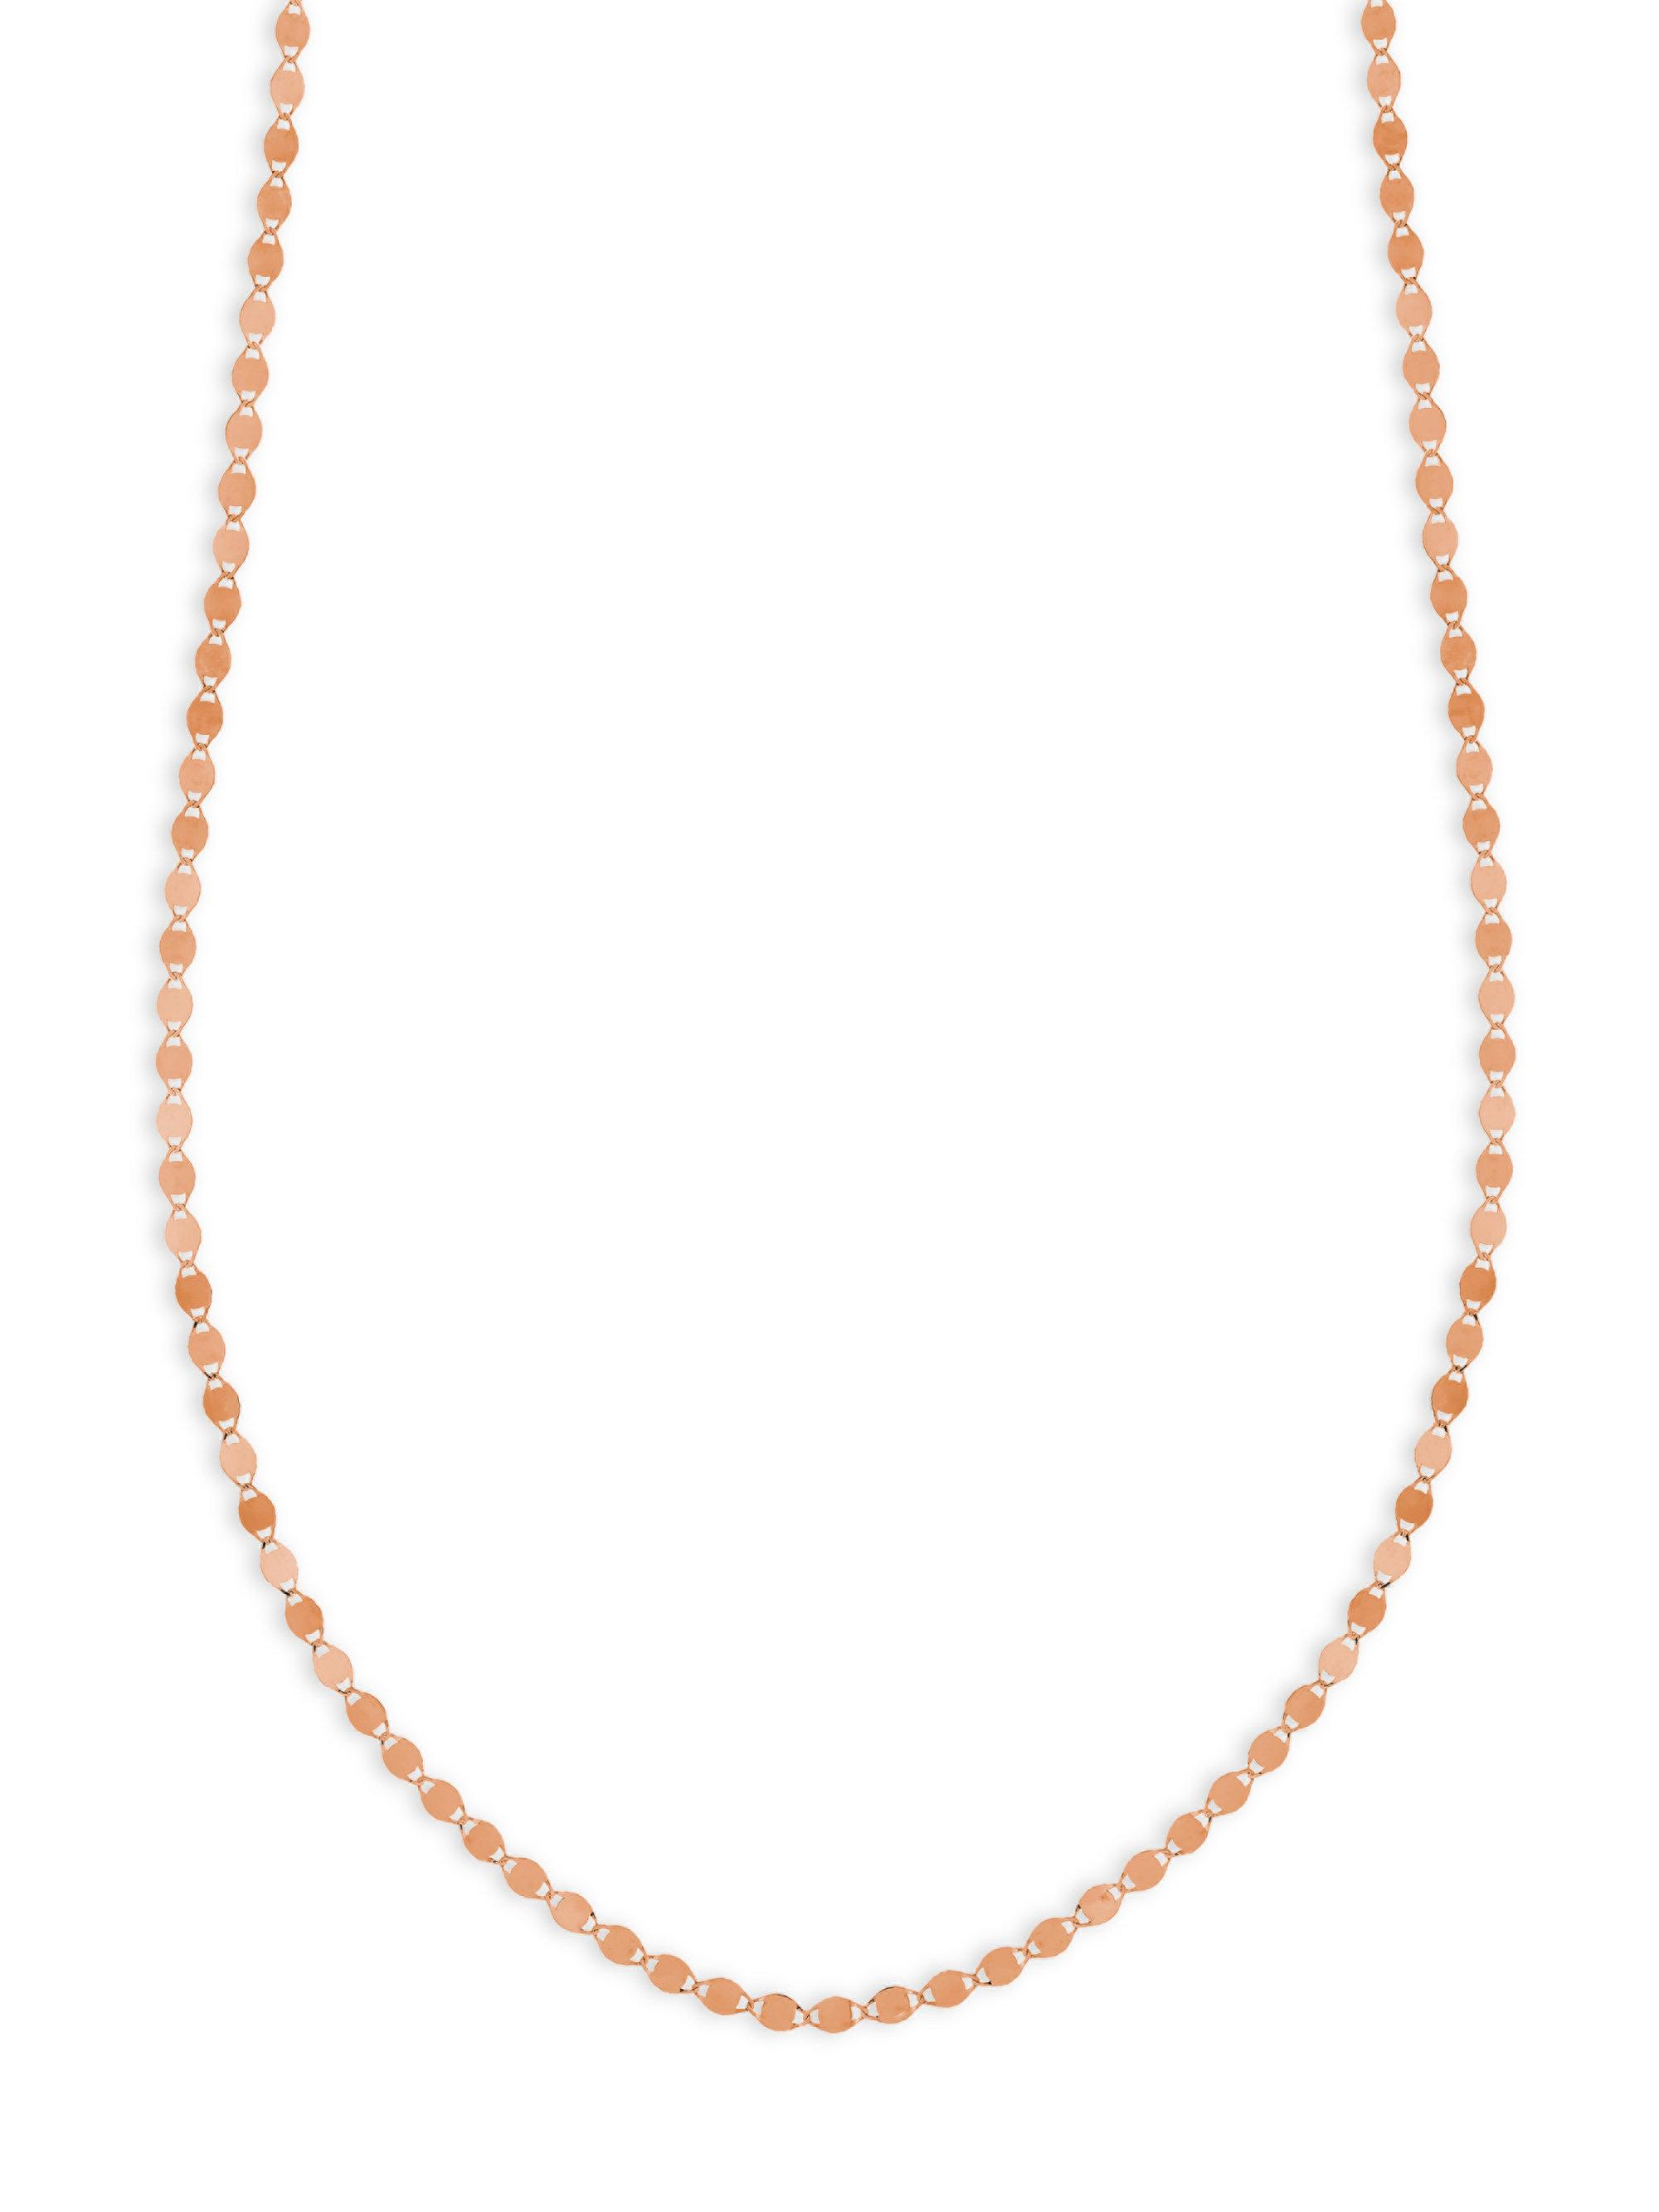 Lana Jewelry Short Nude Three-Strand Necklace, 16